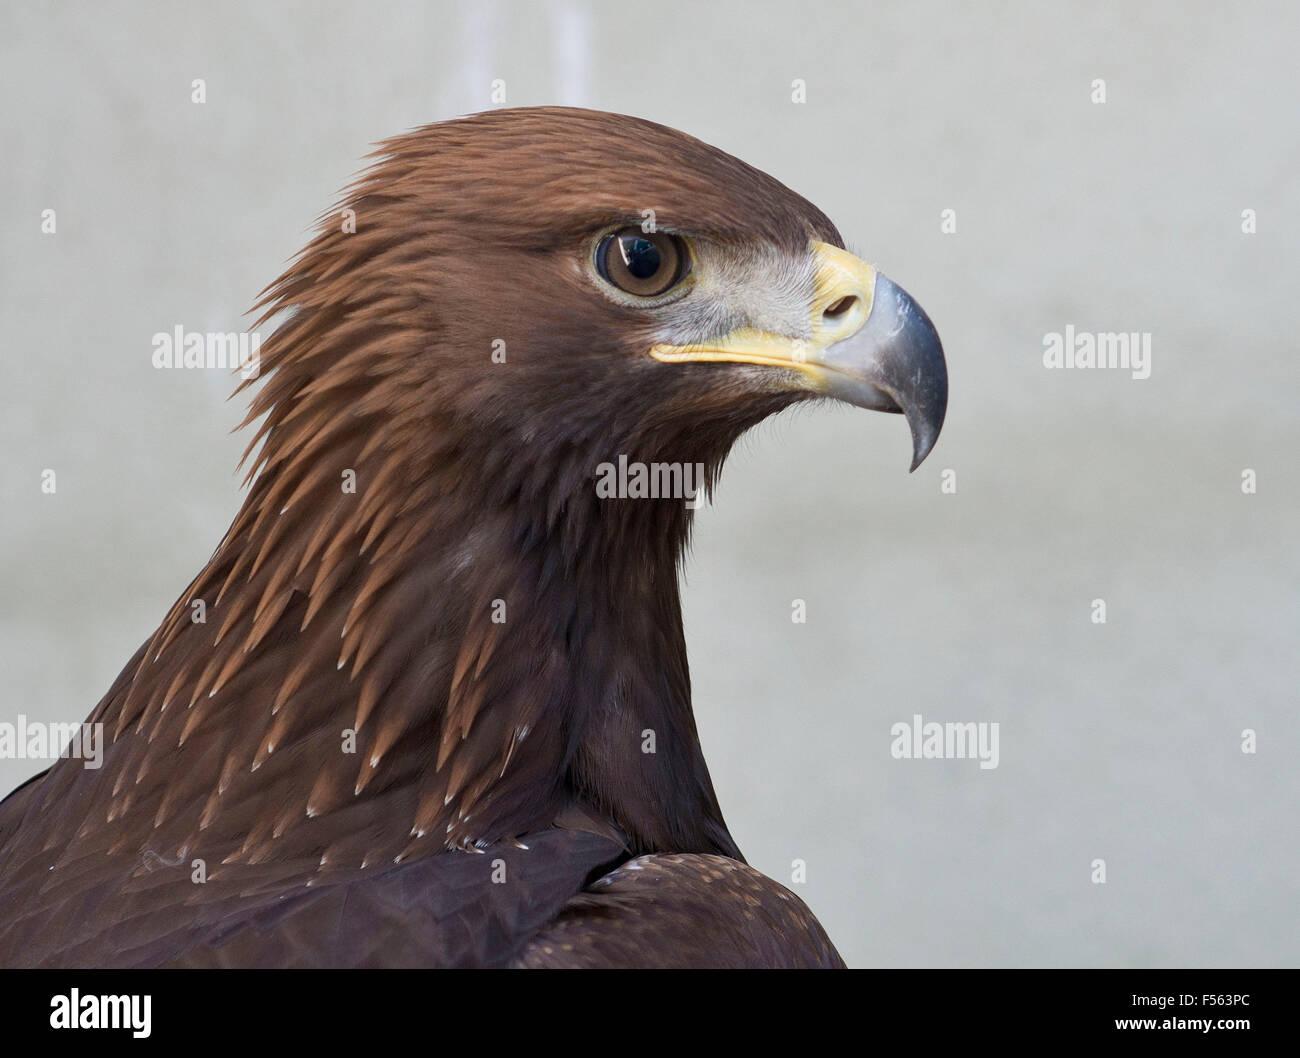 Aquila chrysaetos, Aguila Real, Golden Eagle, Photo Stock